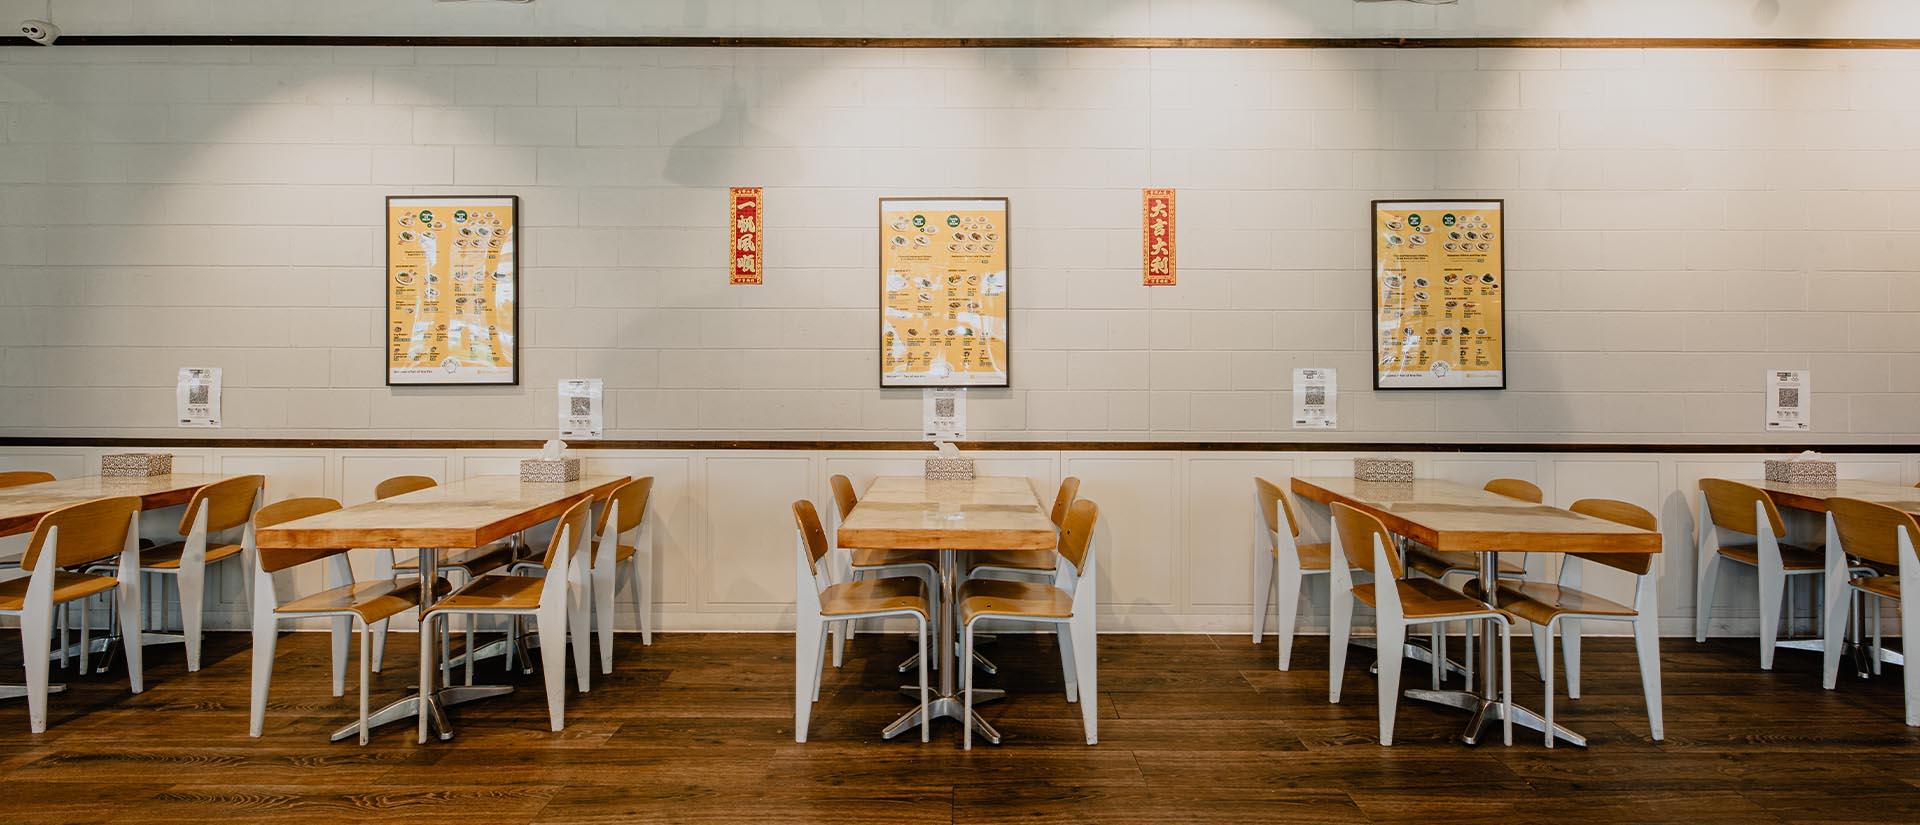 Projects-Restaurant_Gai Wong-2